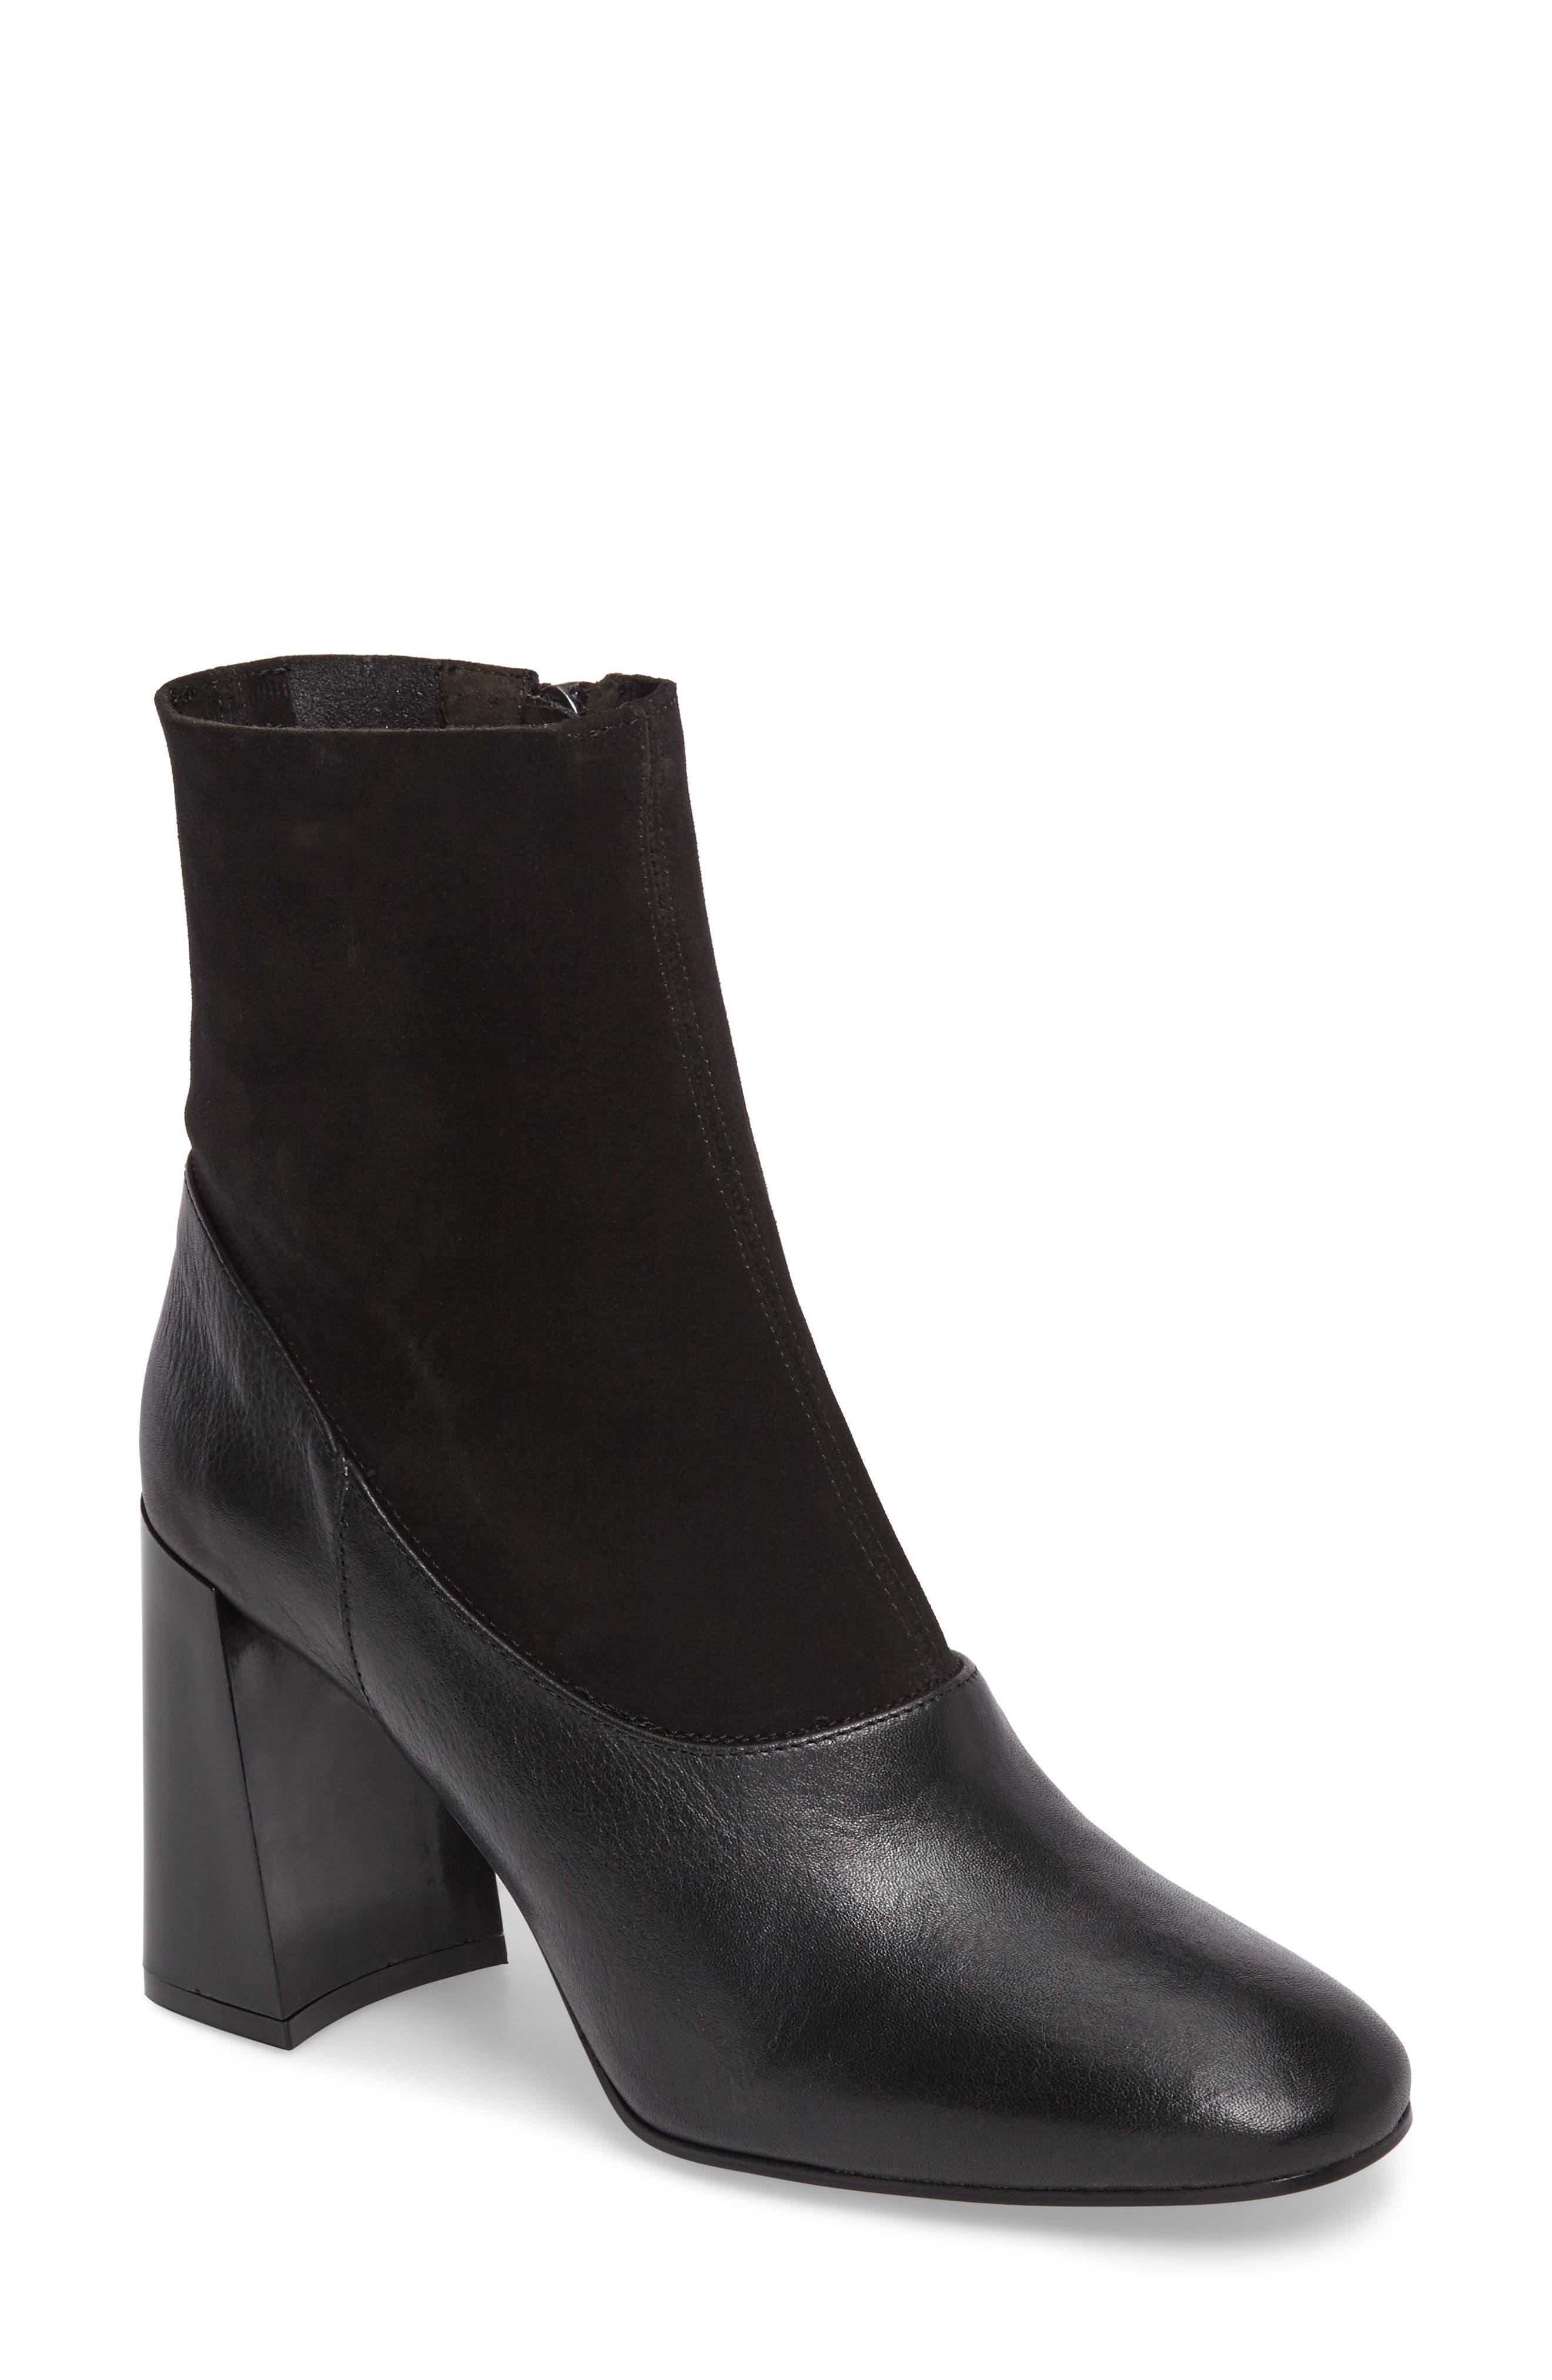 Holi Sock Bootie,                         Main,                         color, Black